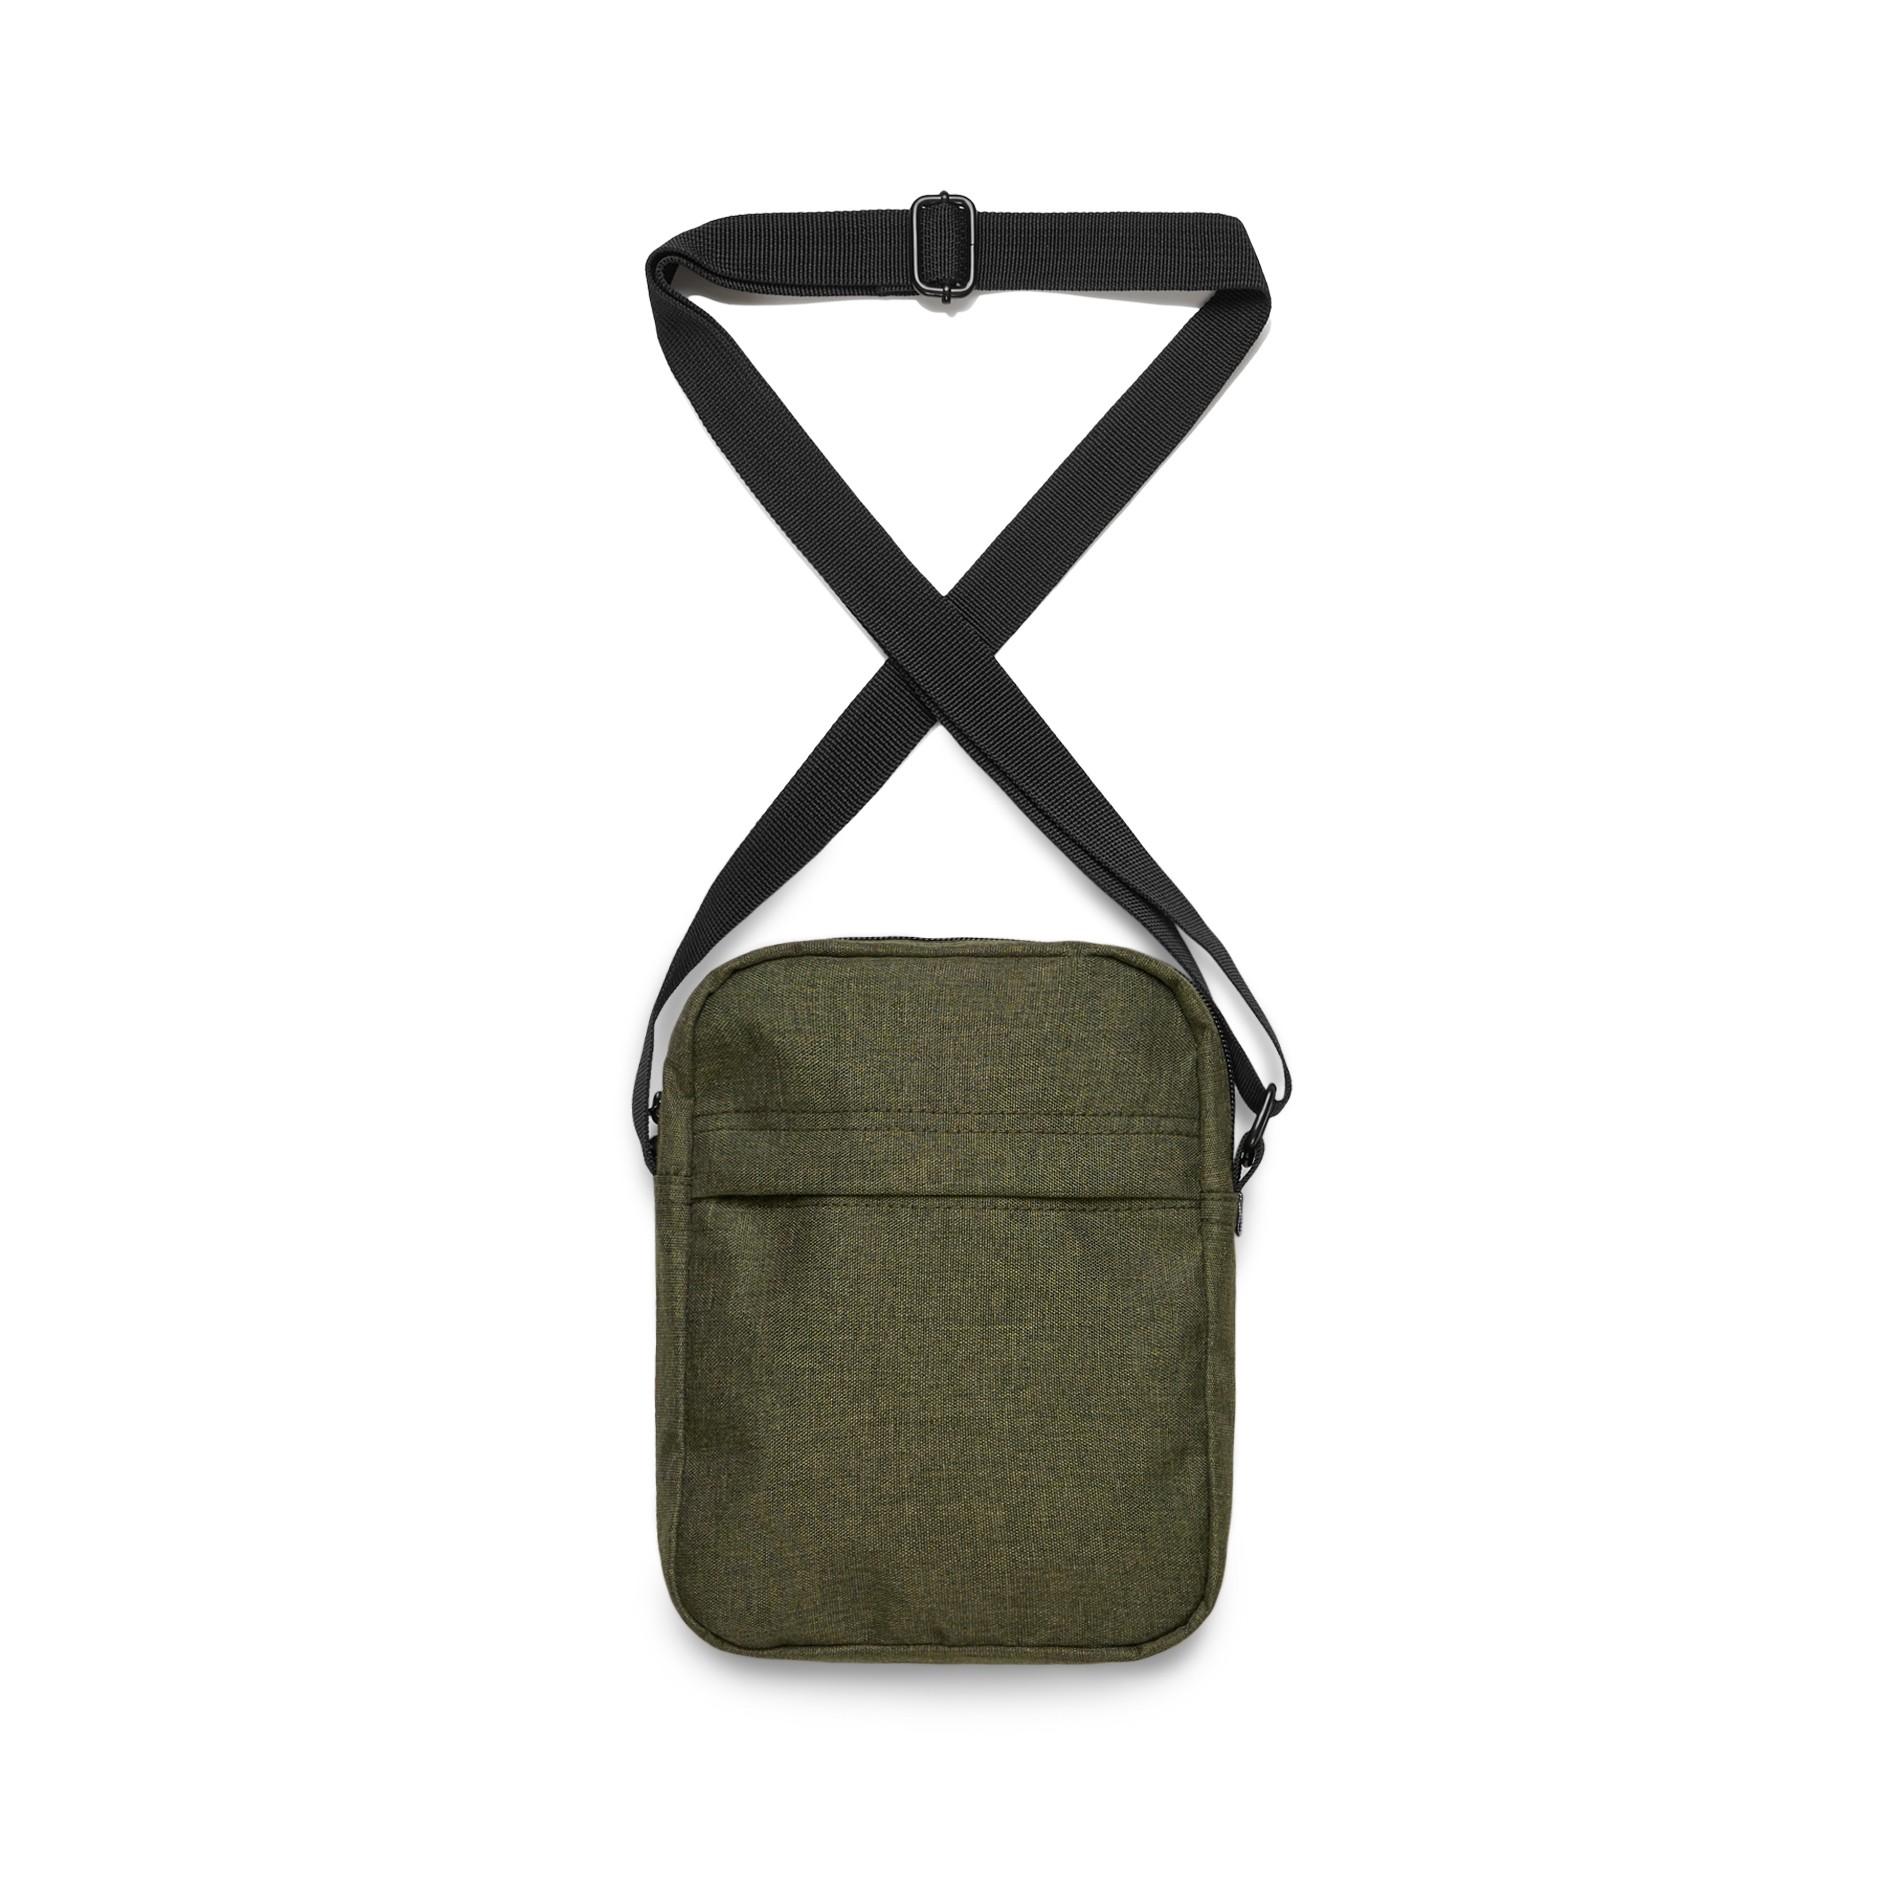 AS Colour Flight Contrast Bag